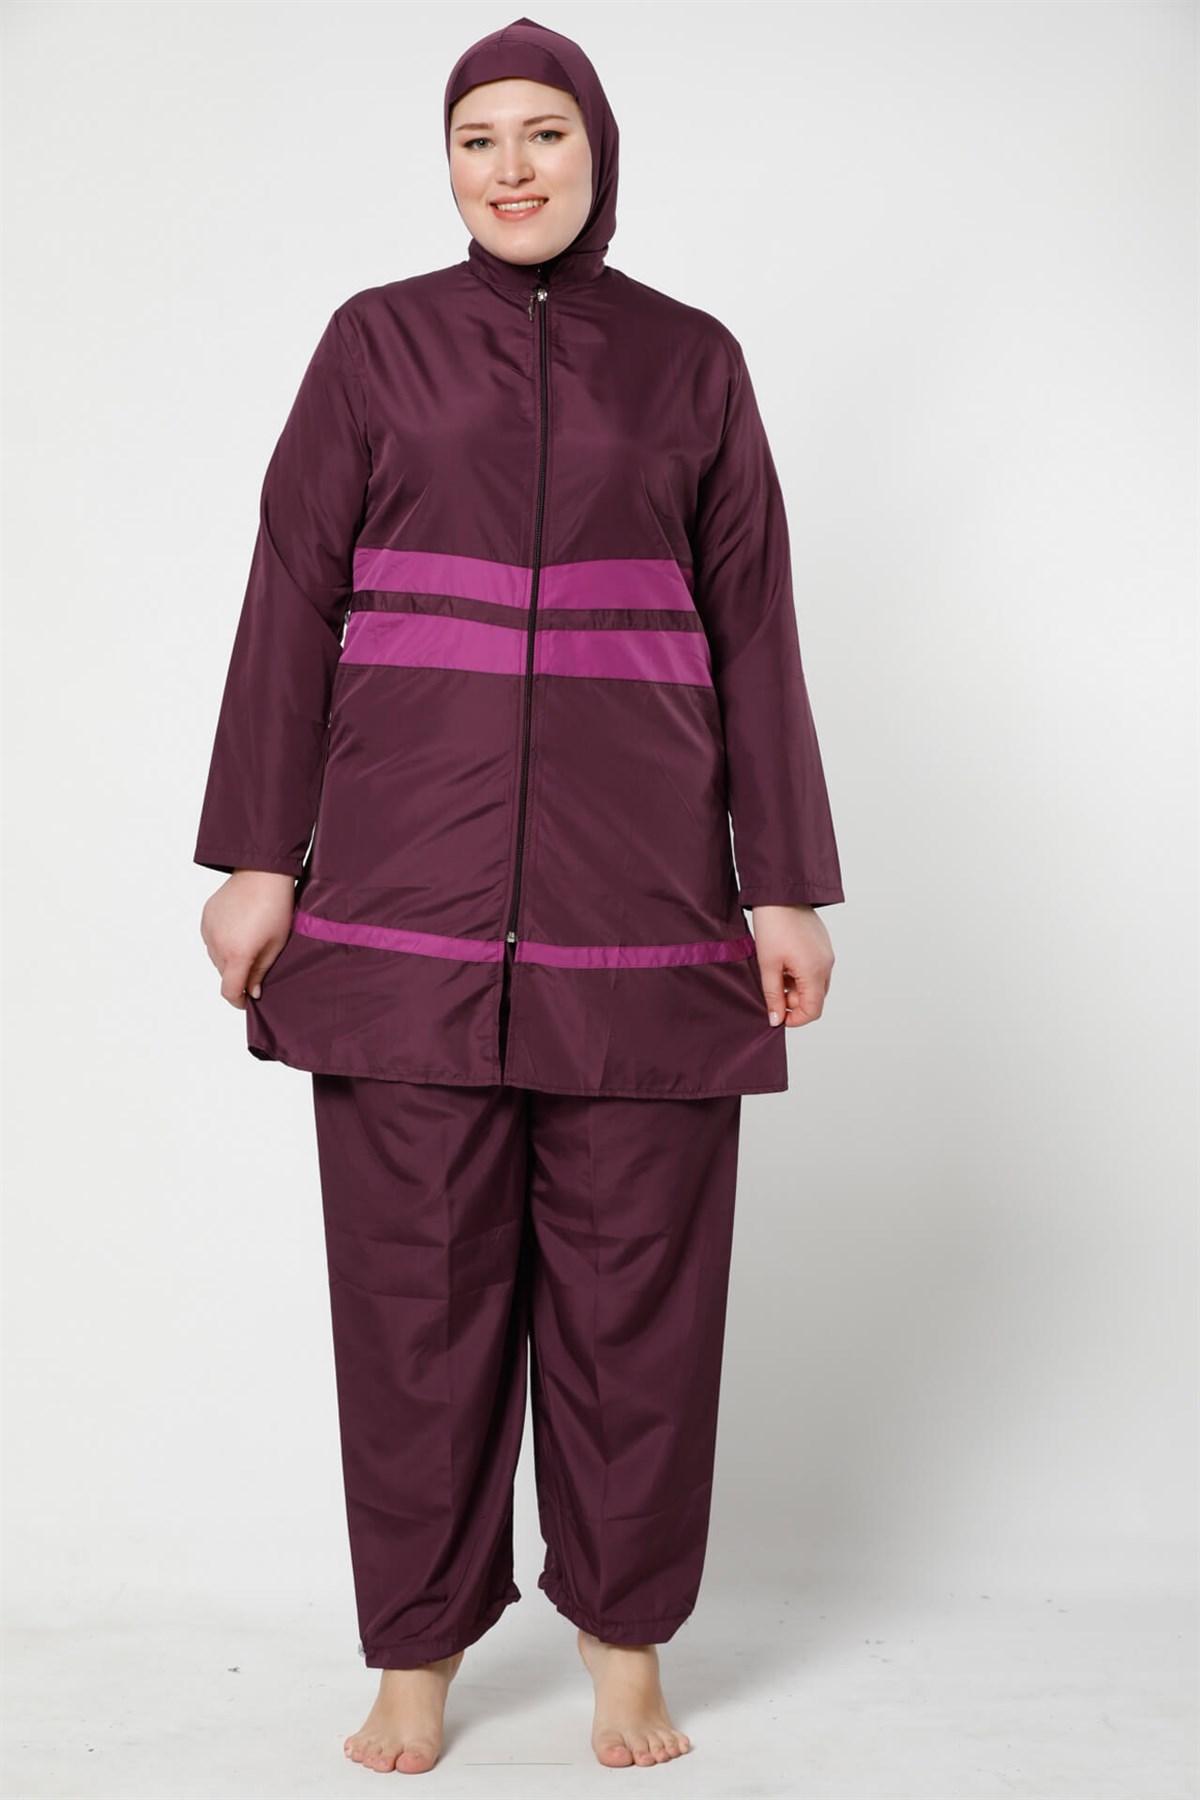 Fashion Cartoon Full Hijab Large Size Swimwear 28040